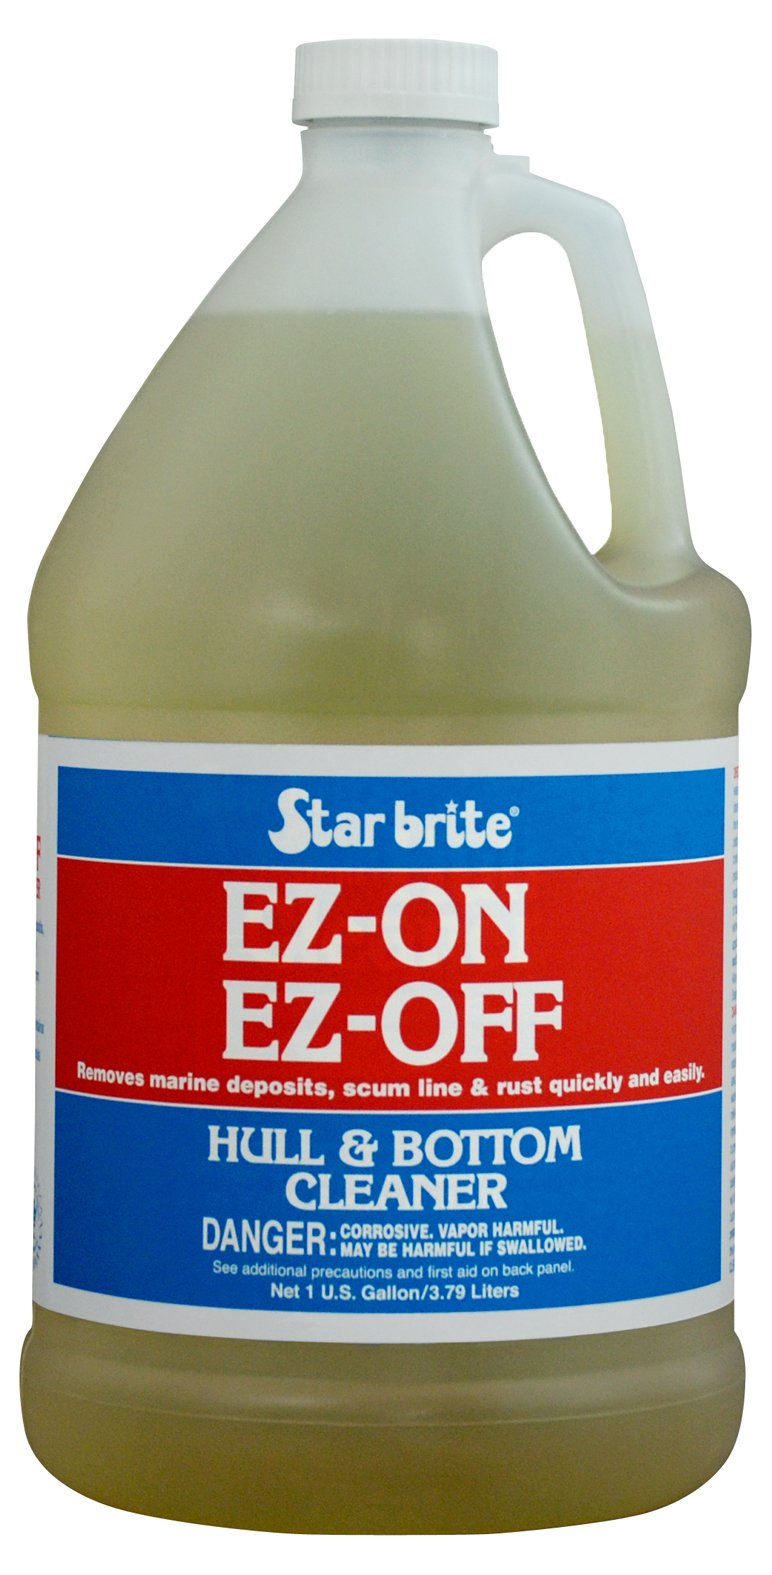 Star Brite EZ-ON EZ-OFF Hull & Bottom Cleaner 1 Gallon